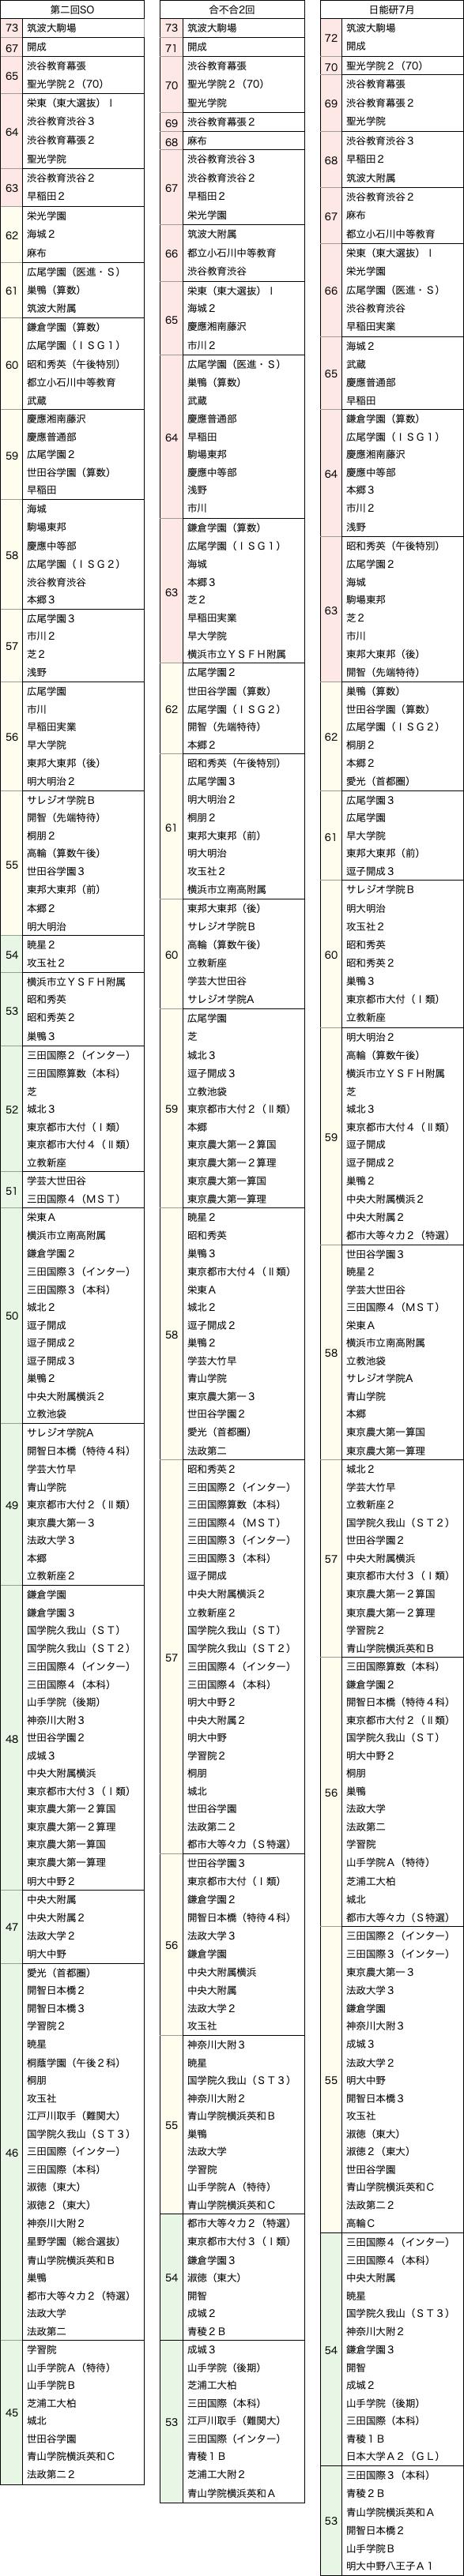 https://e-tutor.tokyo/data/20200821/02.png